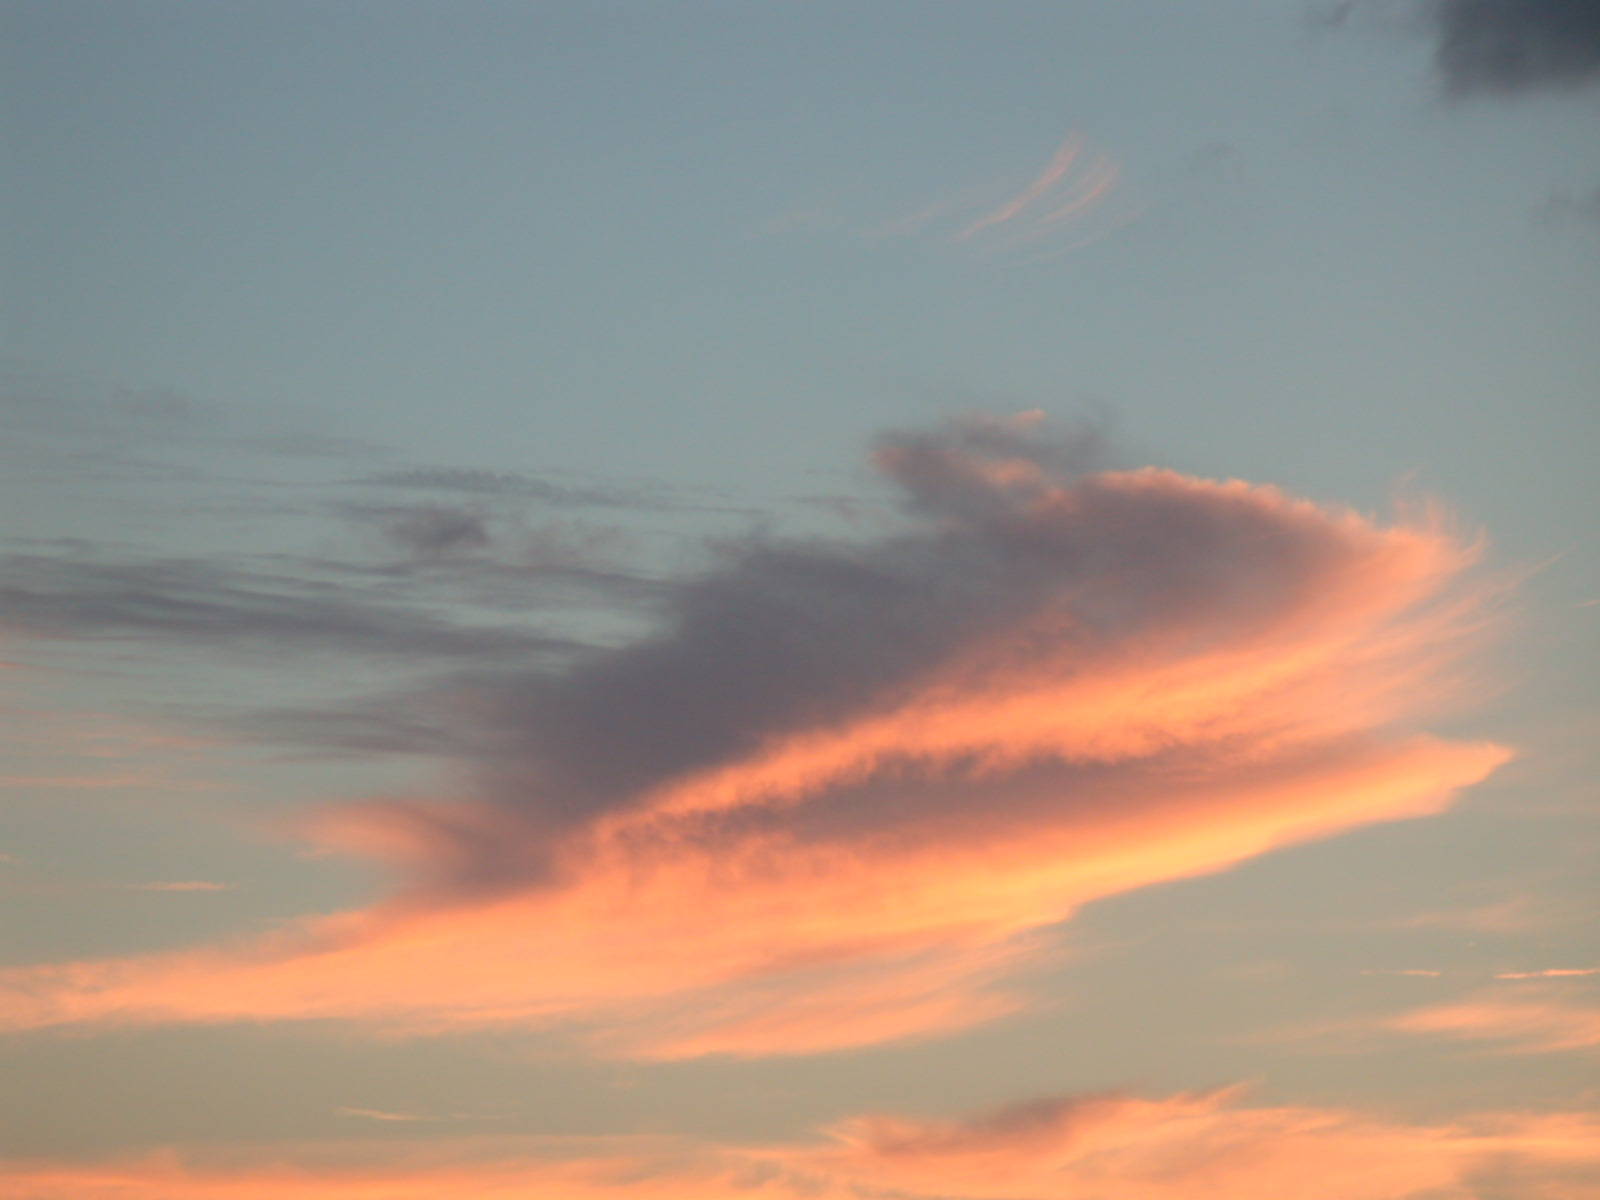 cloud clouds evening dusk dundown red reddish soft